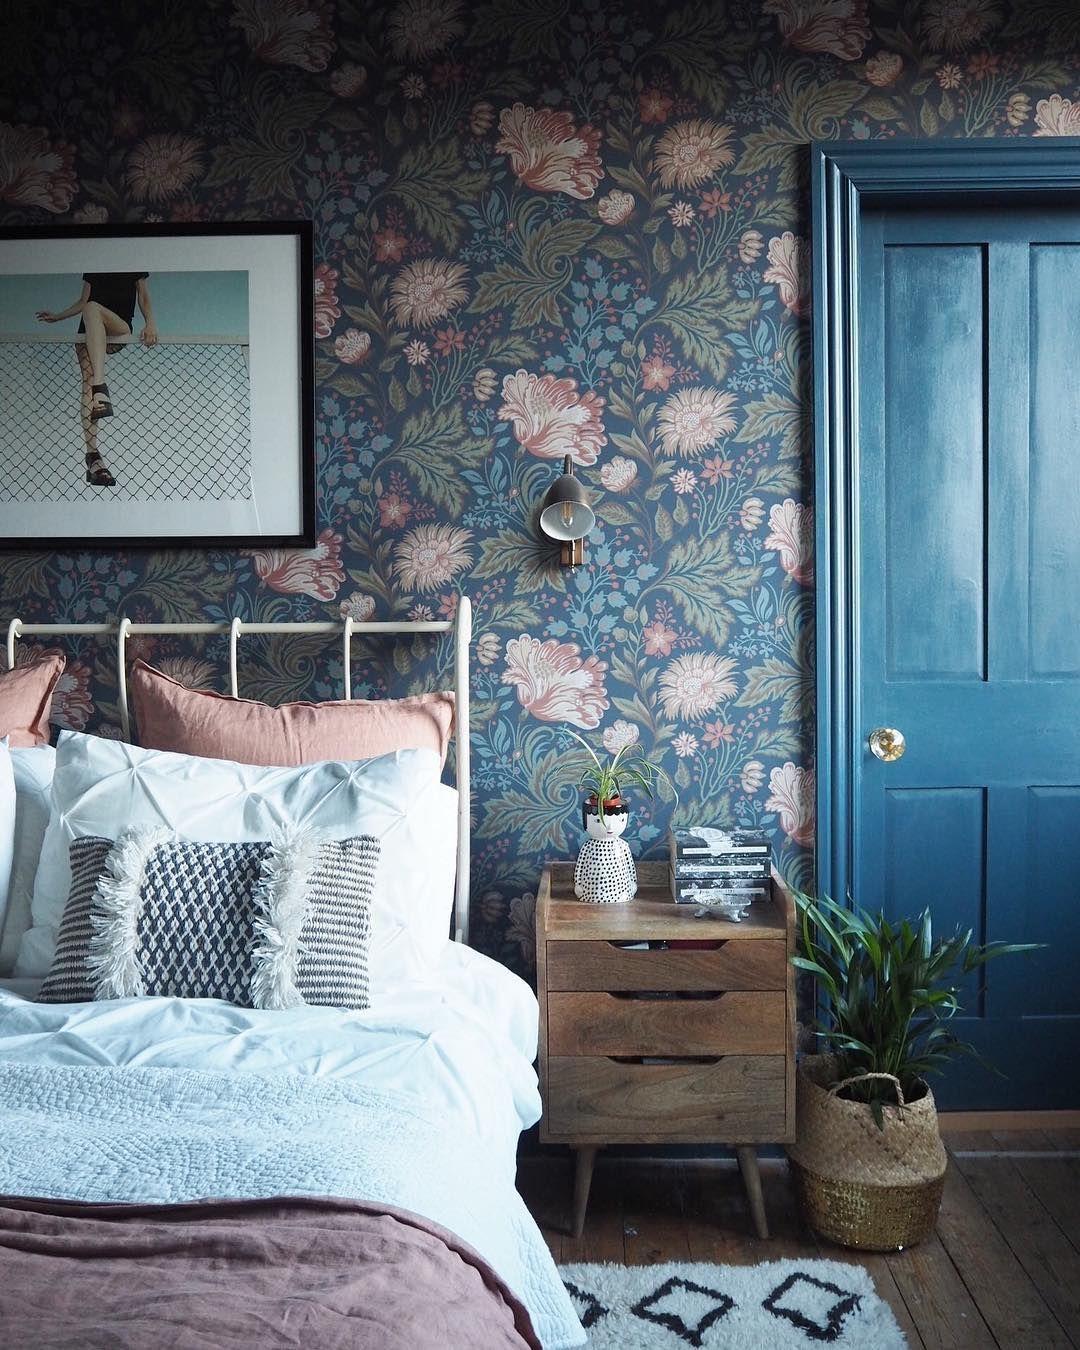 Dormitorio decorado con papel pintado